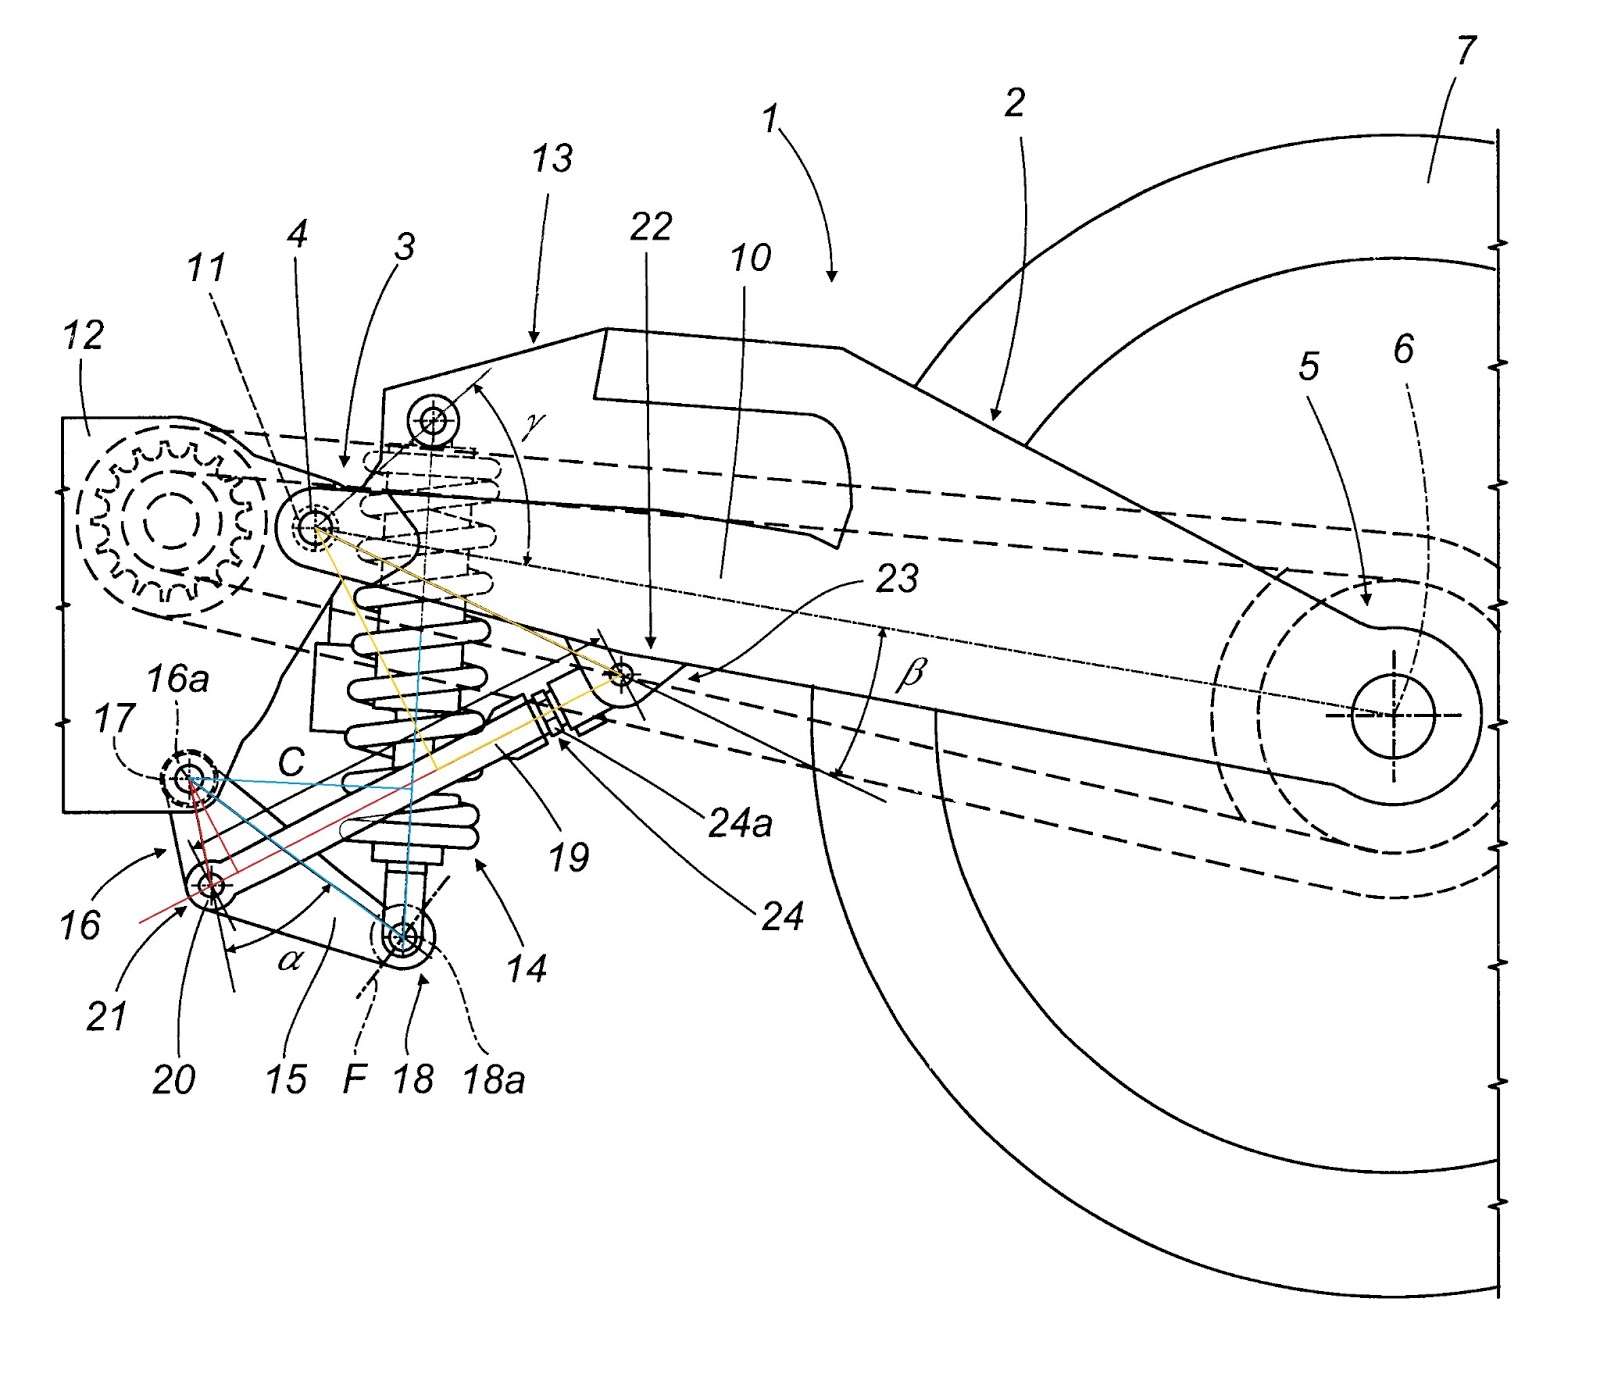 wp instead of bitubo muz manx Wiring Harness link system geometry